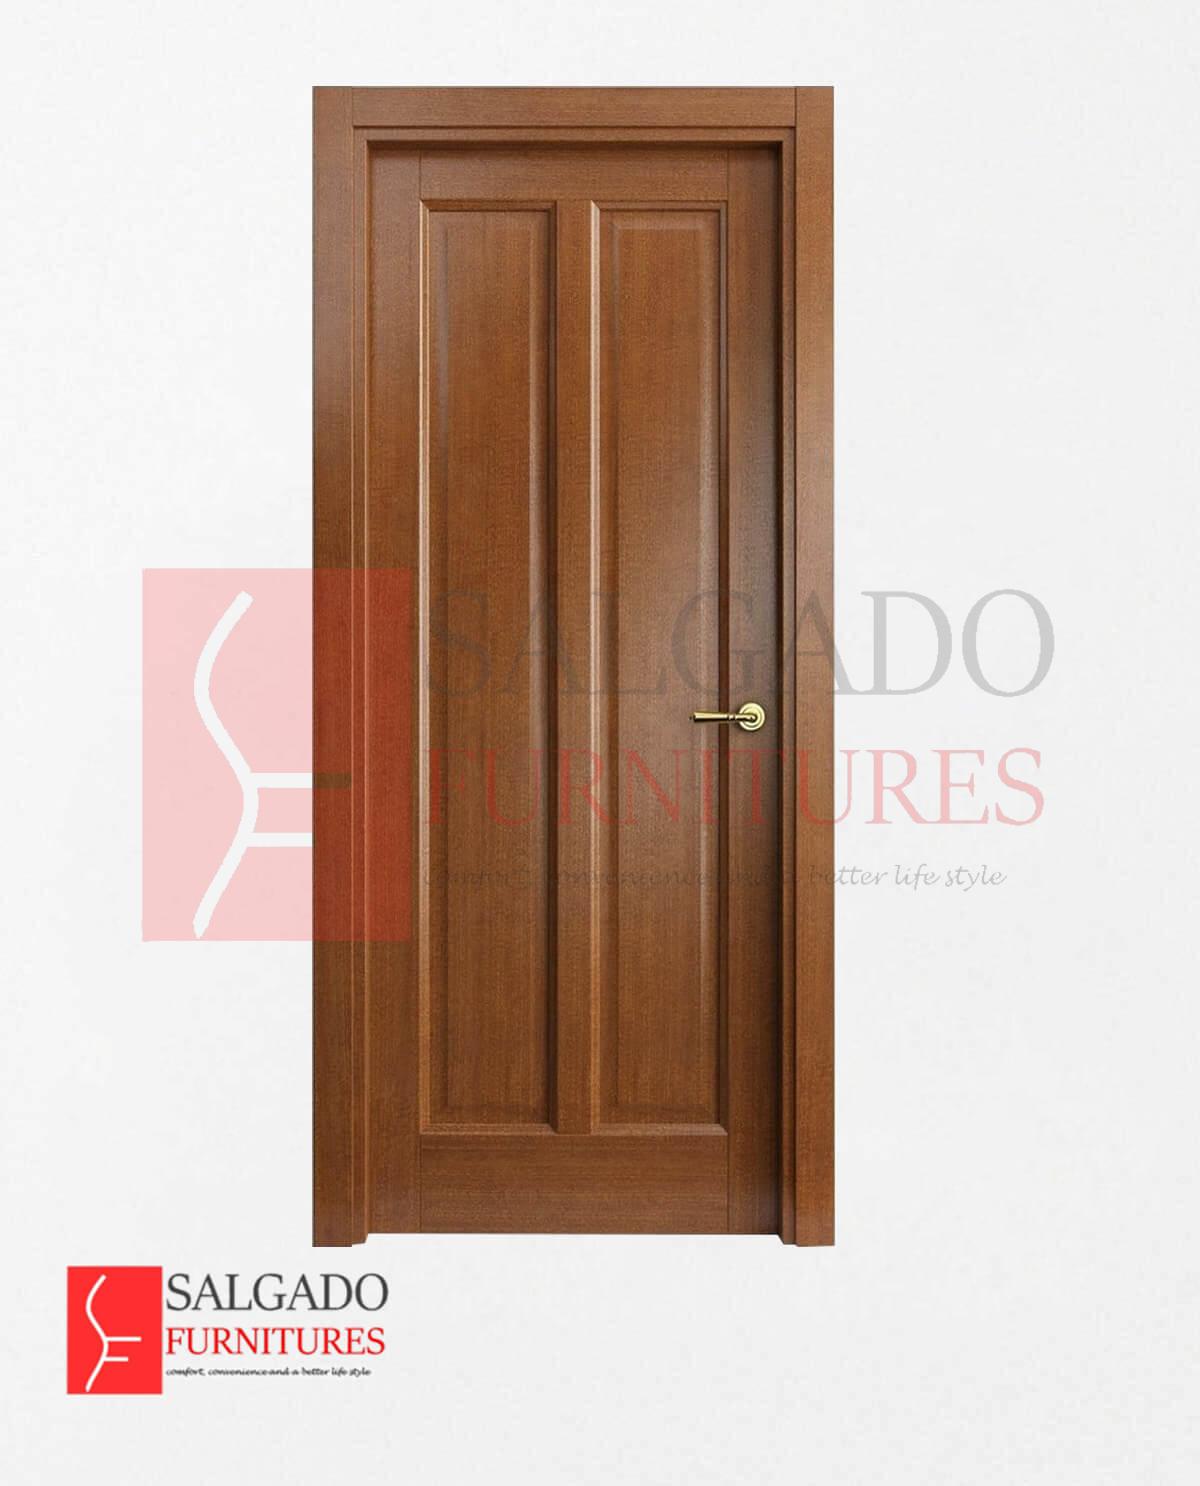 sri lanka-furniture-buy-online